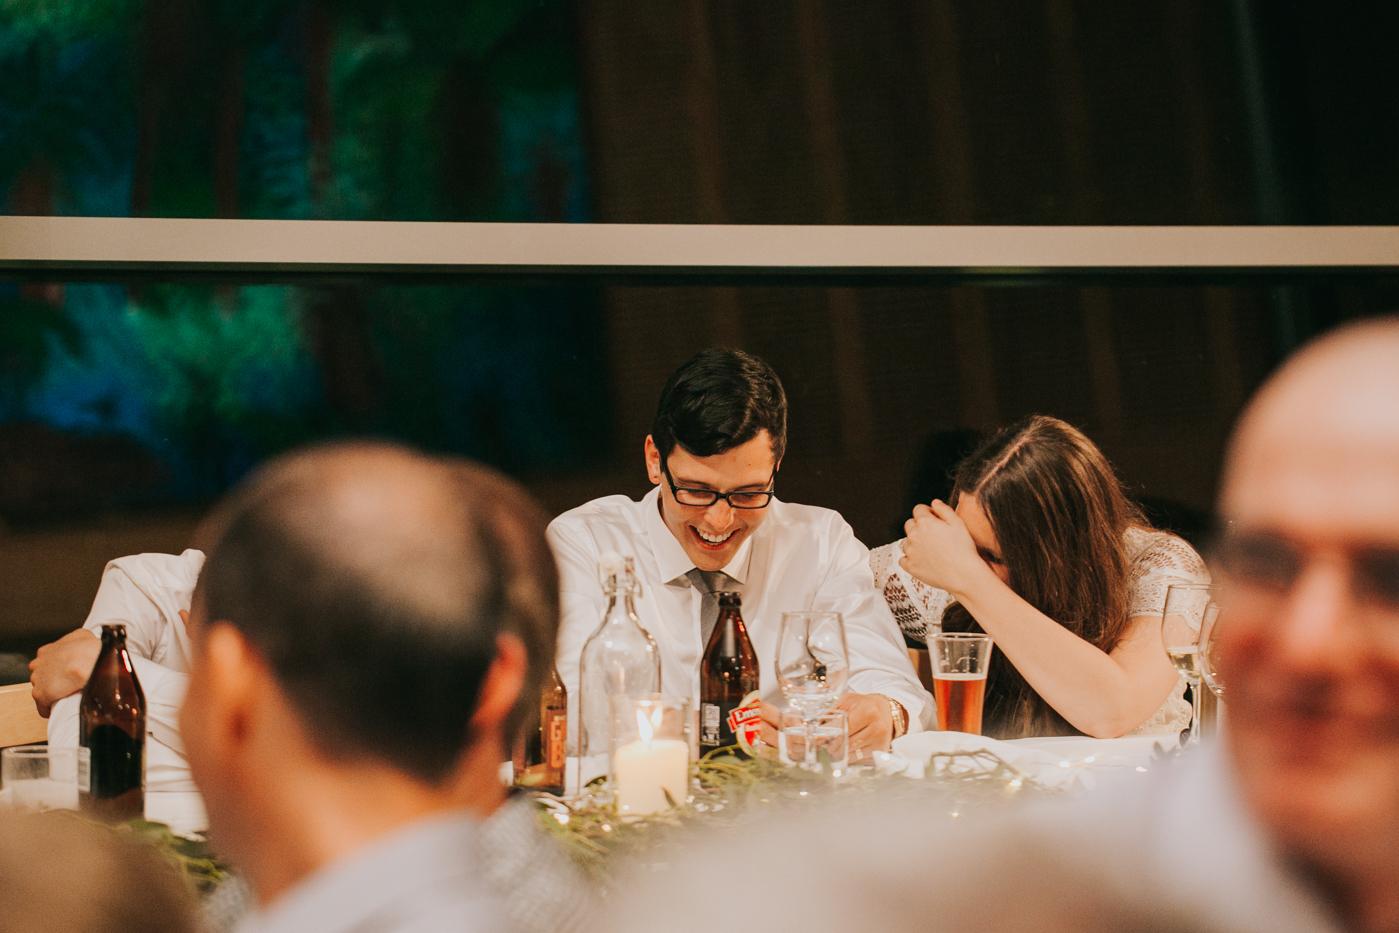 Ariana & Tim - Dunedin, New Zealand Wedding - Destination Wedding - Samantha Heather Photography-273.jpg